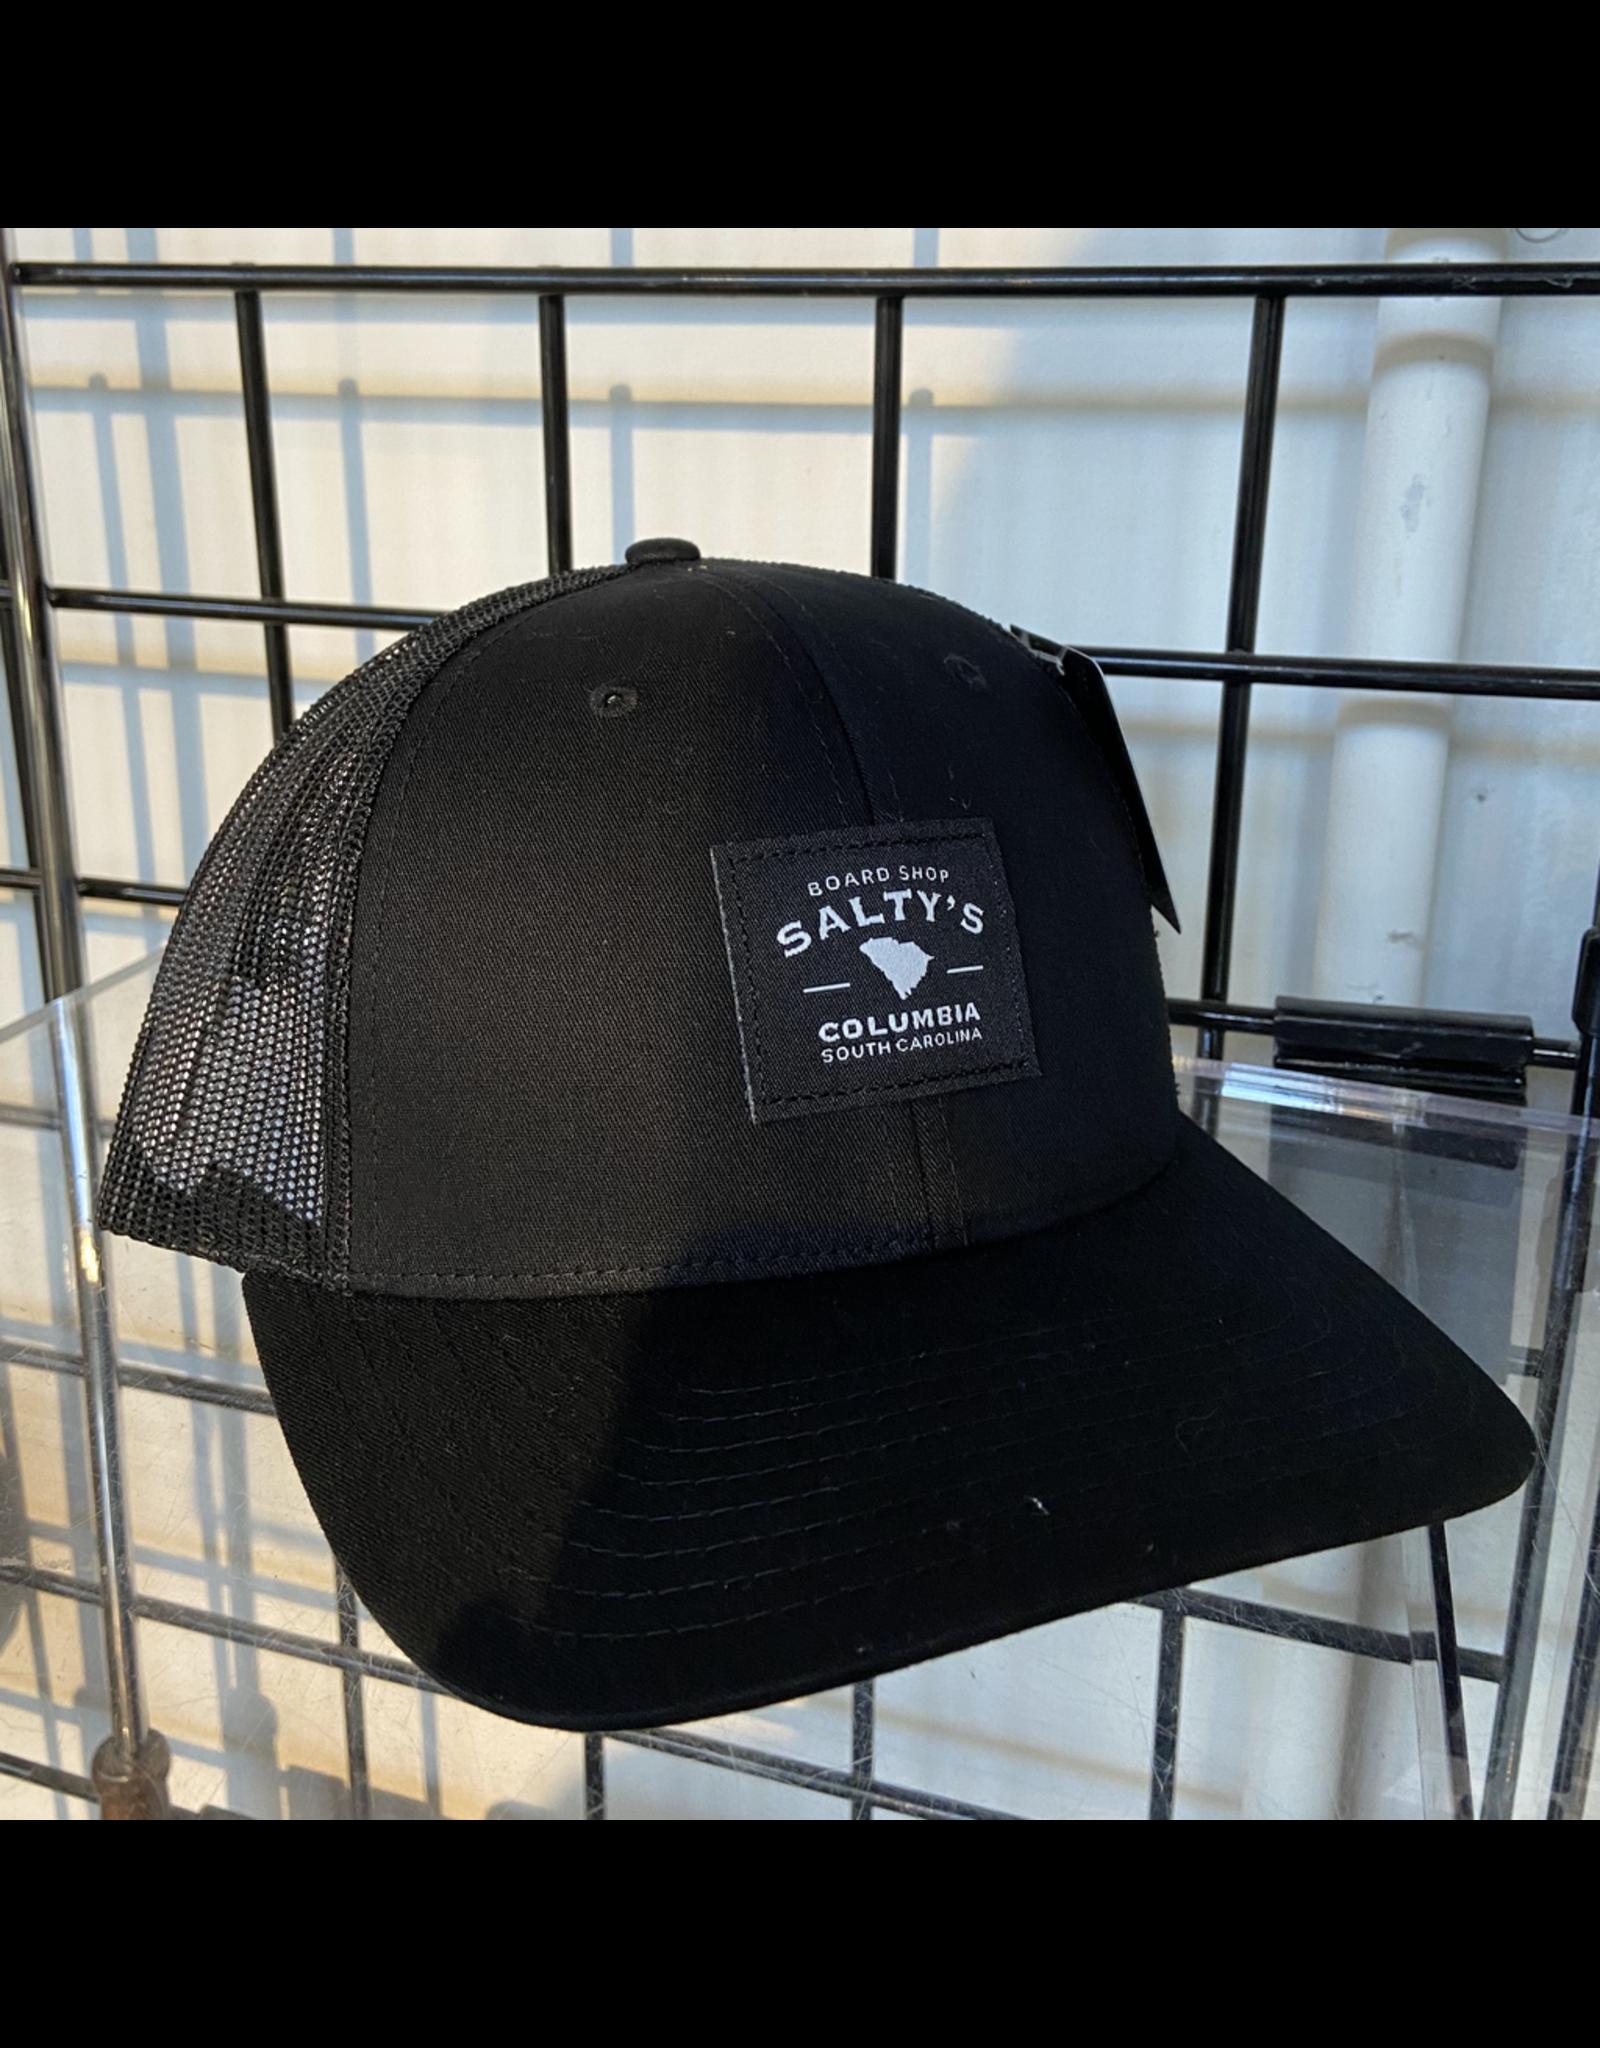 RICHARDSON 115 SOLID BLACK SALTY'S TRUCKER HAT